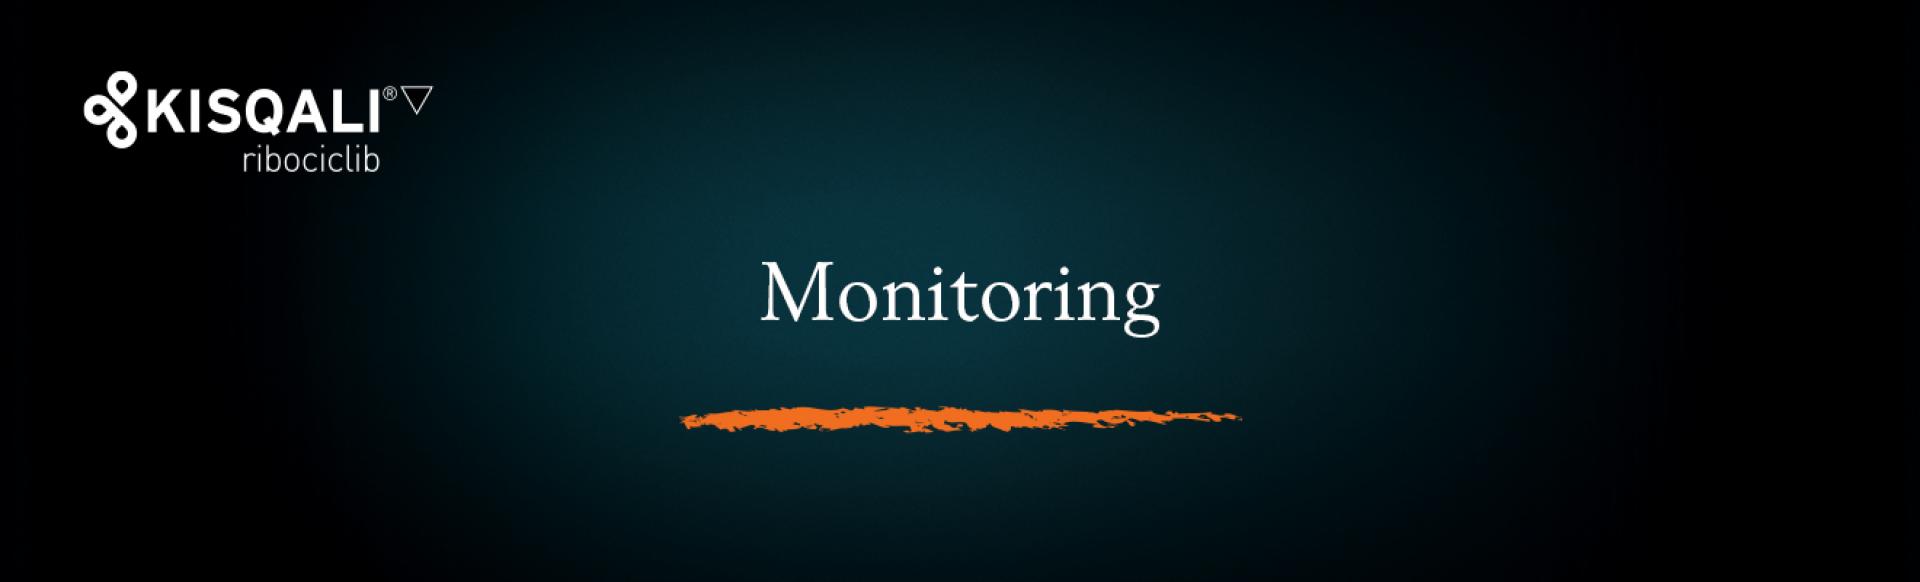 Top banner. Monitoring